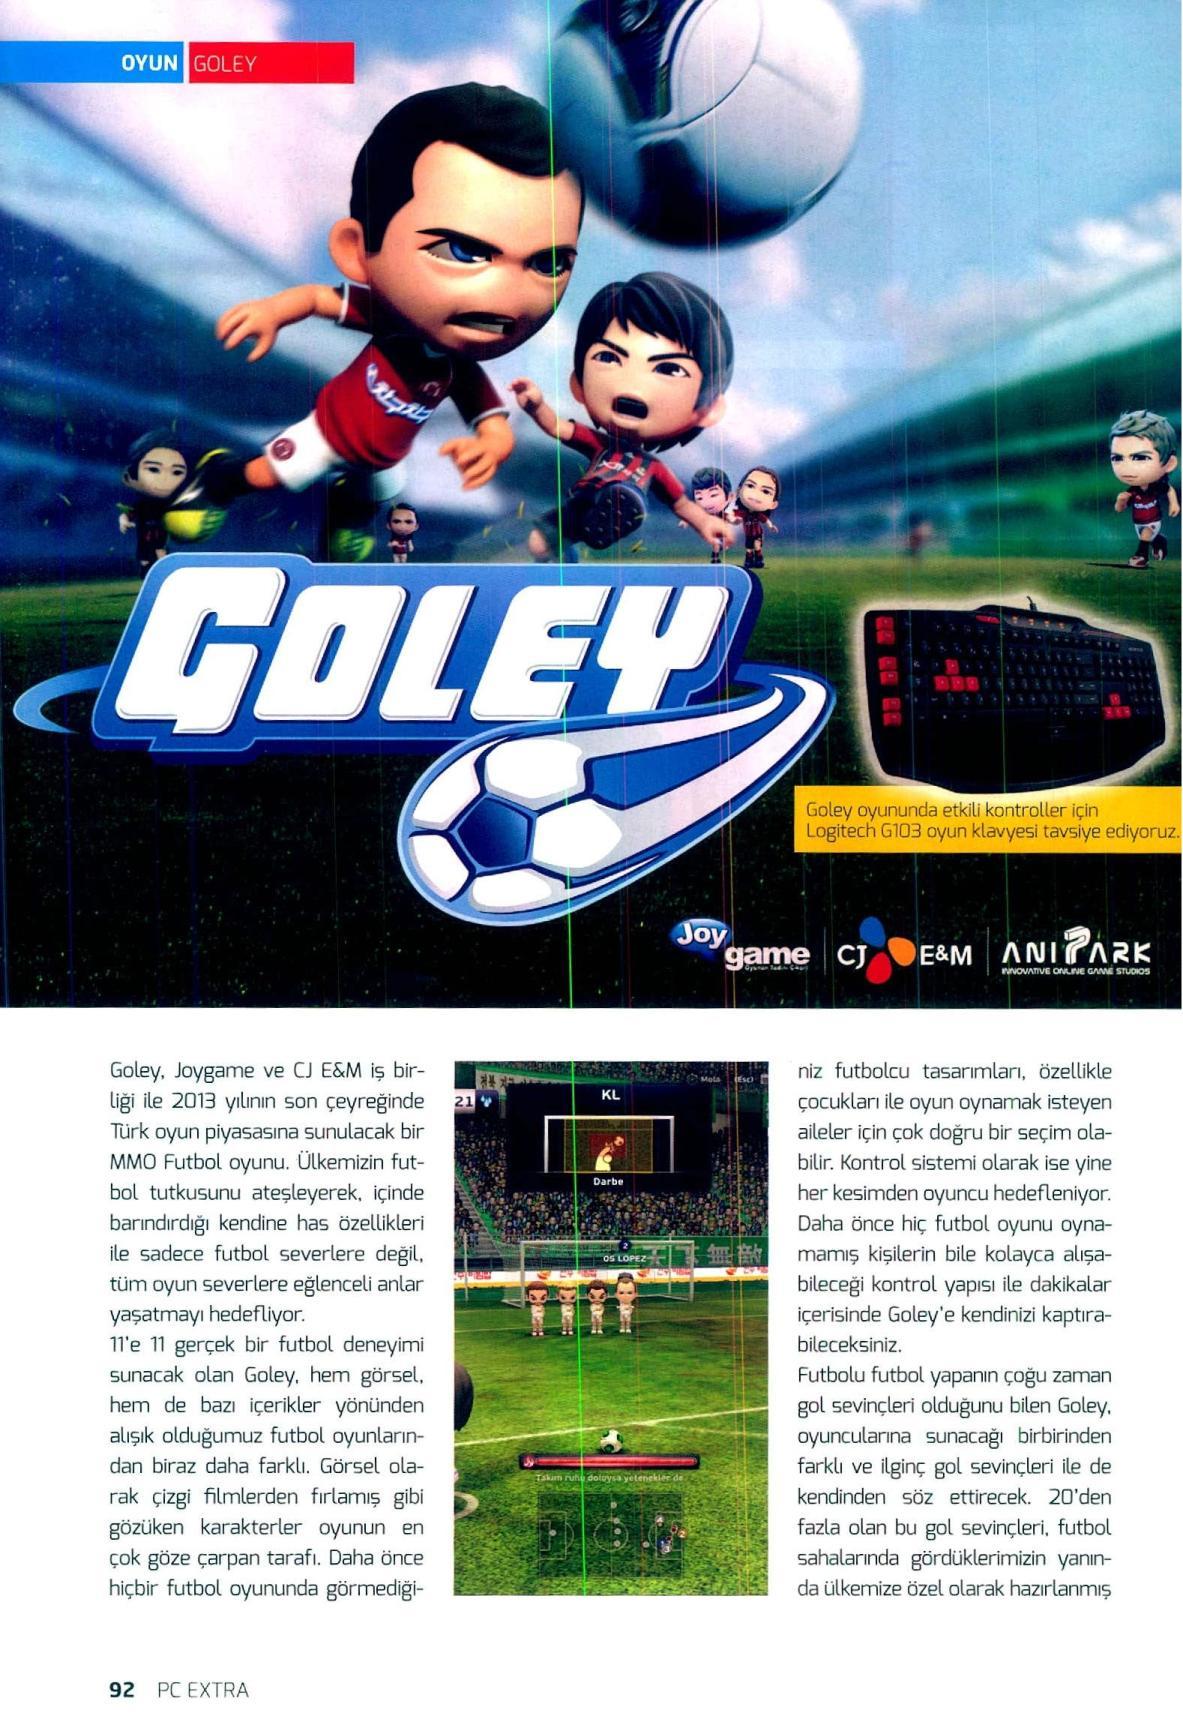 Netmarble-Turkey-PC-Extra-Sayfa-92-01.12.14